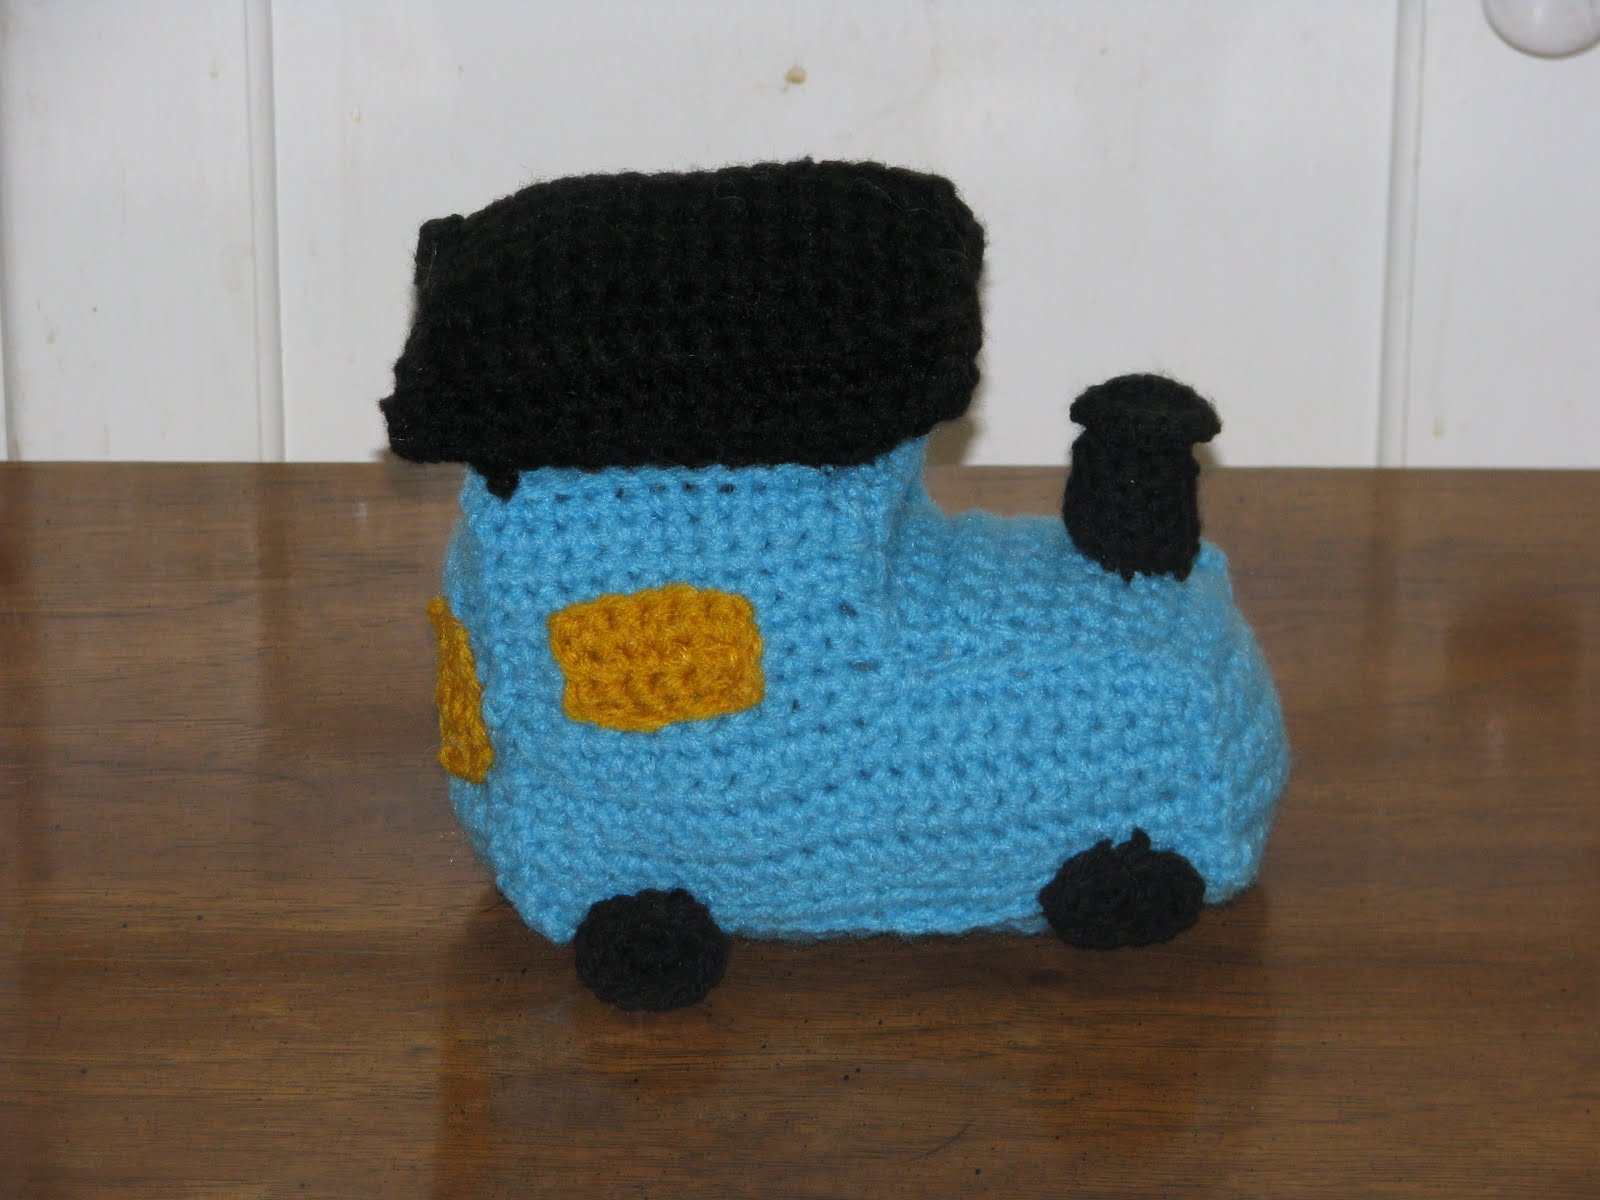 train conductor hat - Crochet Me